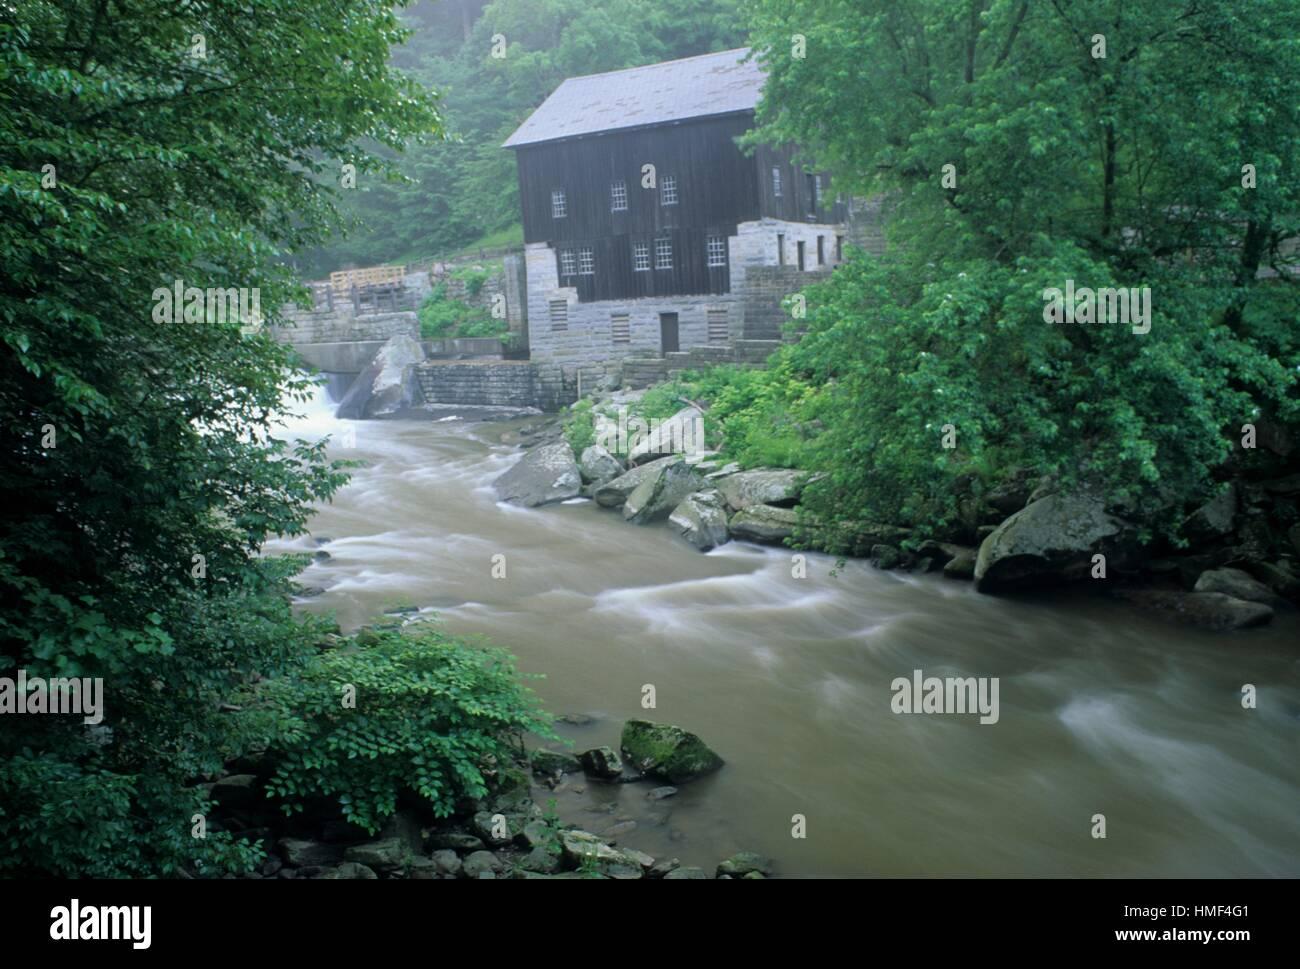 McConnell's Mill & Slippery Rock Creek, McConnell's Mill State Park, Pennsylvania. Imagen De Stock